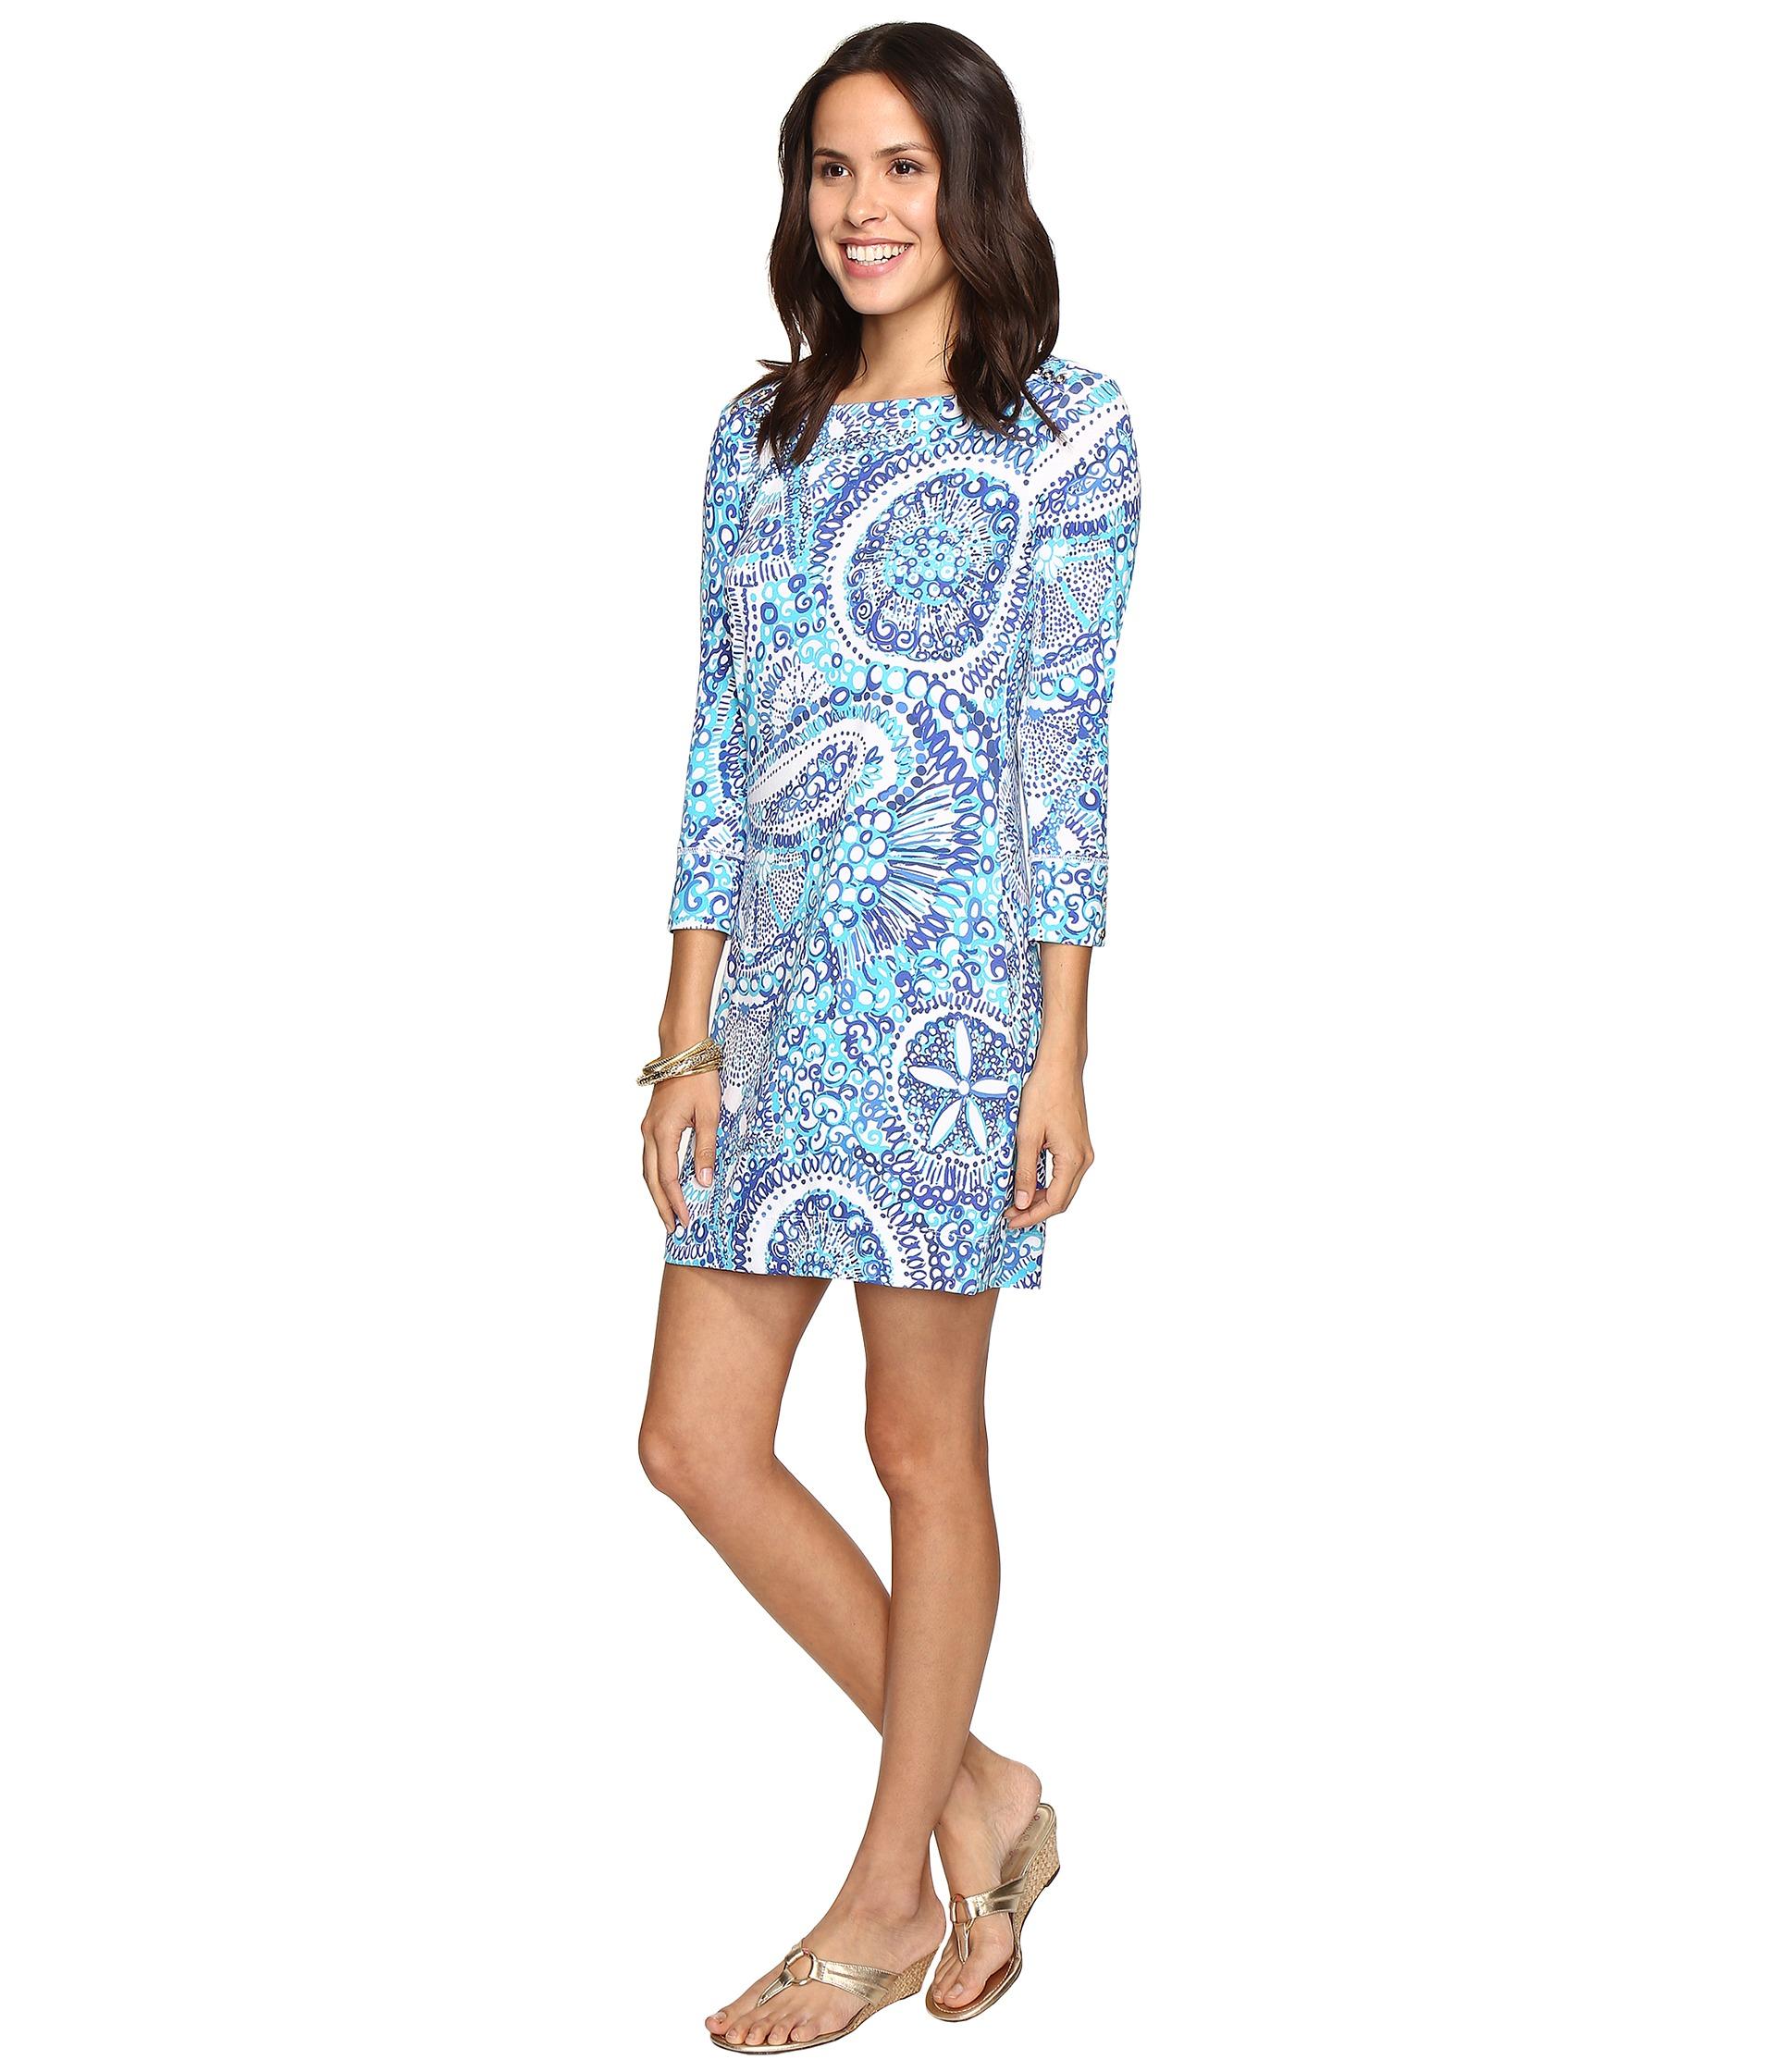 Sophie Dress: Lilly Pulitzer UPF 50+ Sophie Dress Resort White/Midnight